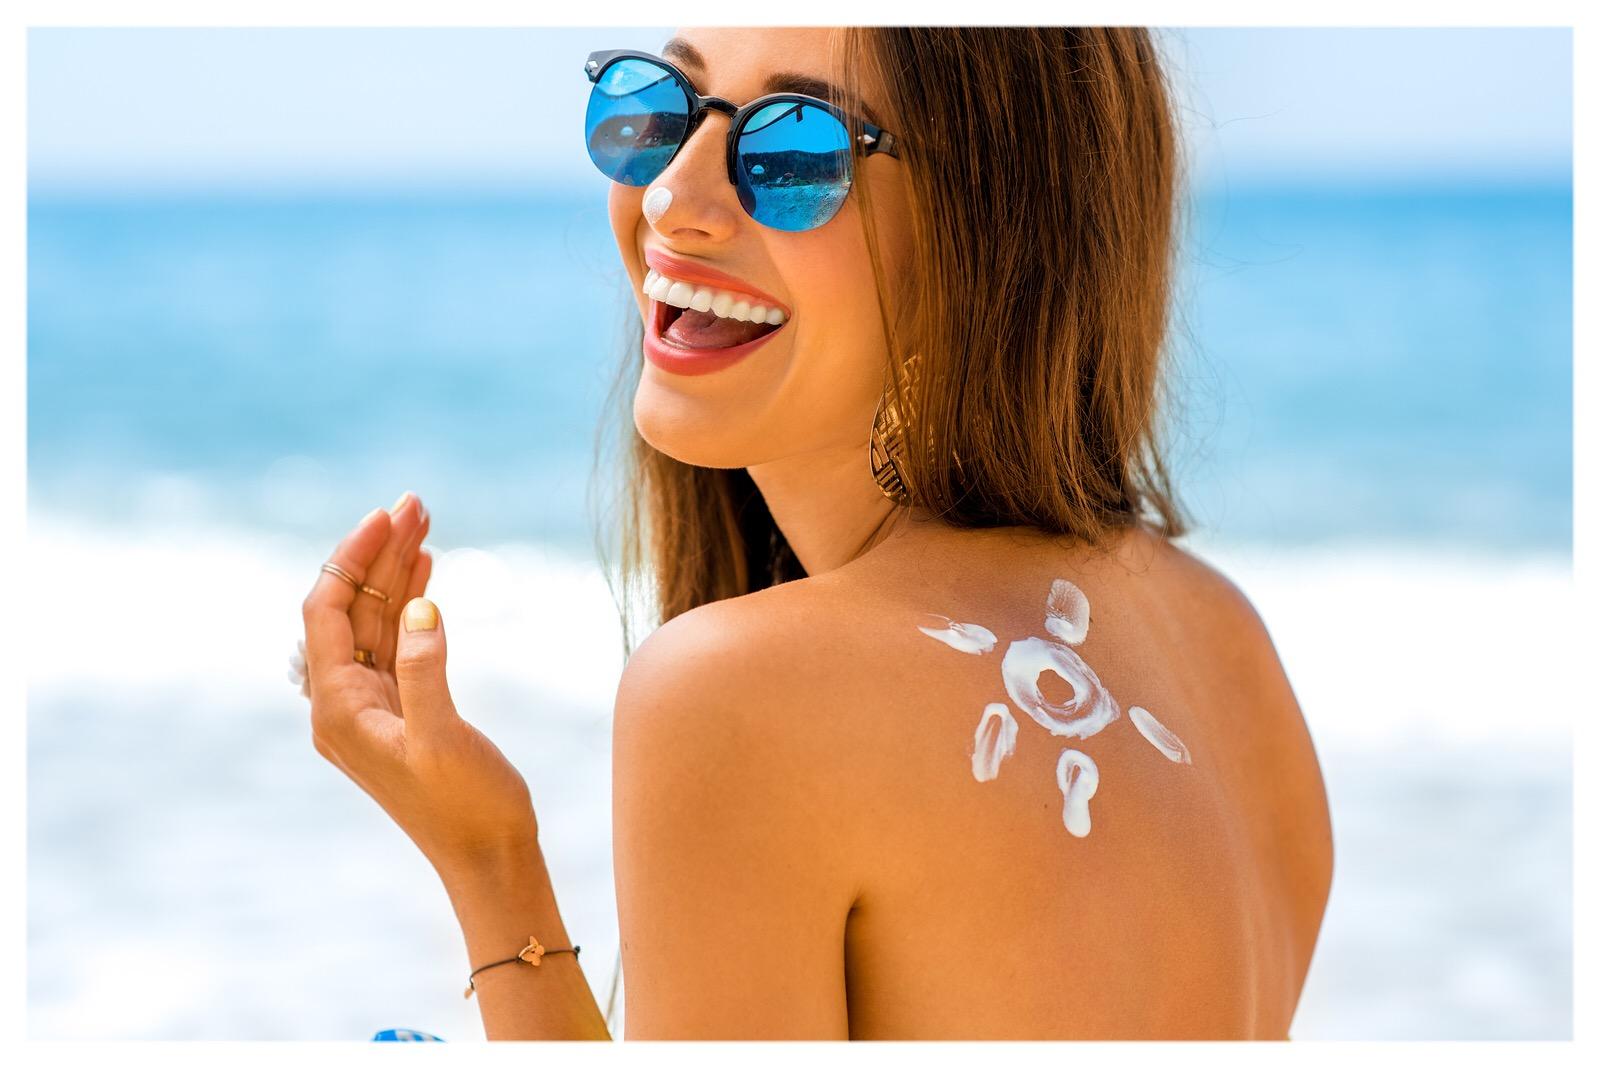 spf,  skincare musts,  anti aging, skin rejuvenation,  vitamin d,  vitamin c,  age spots,  skincare products,  facial peels